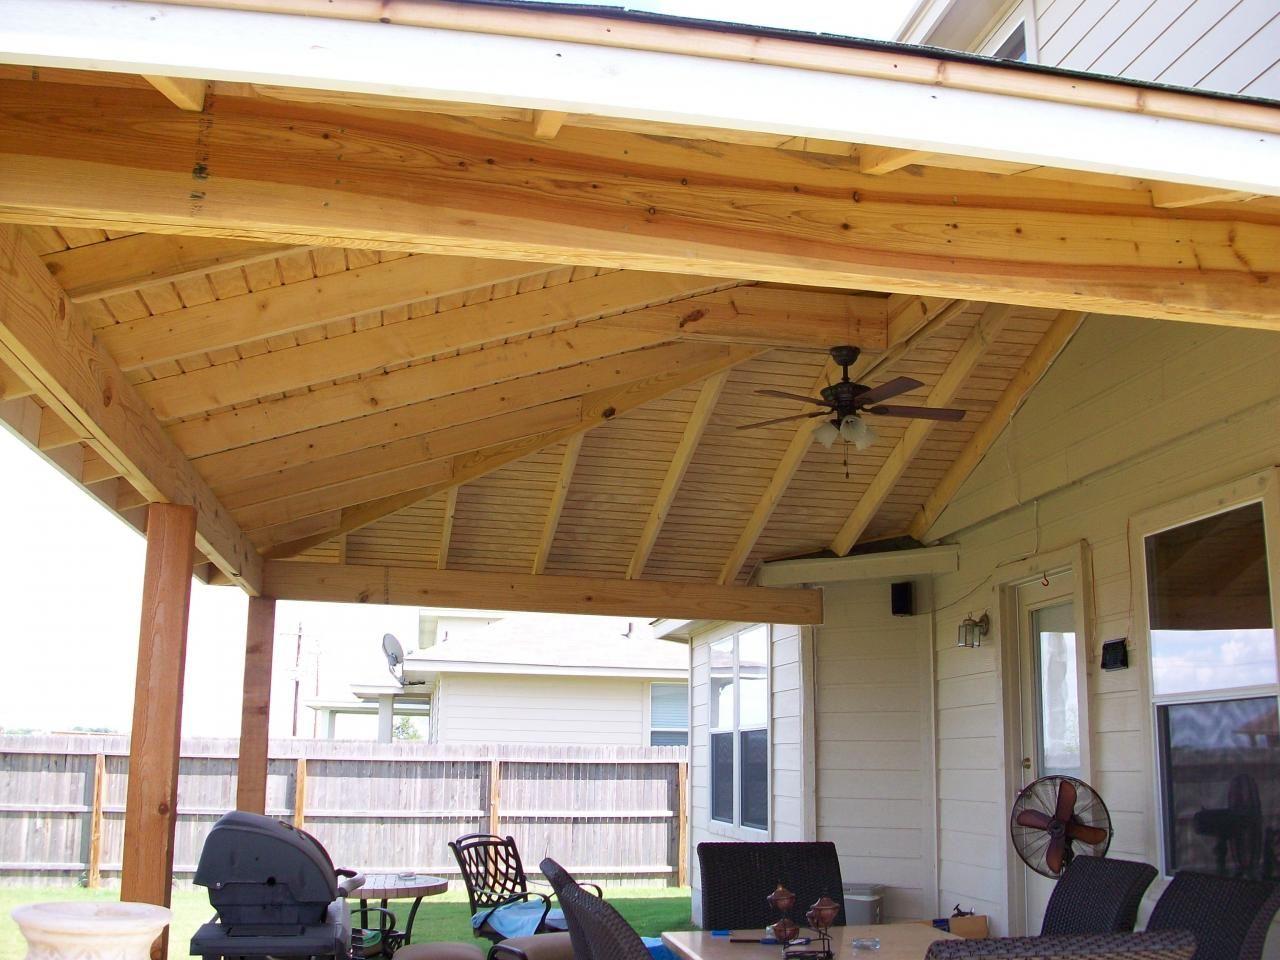 Patio Roof Panels The Application Of Patio Roof Ideas Invado International Pergola Covered Patio Design Patio Design